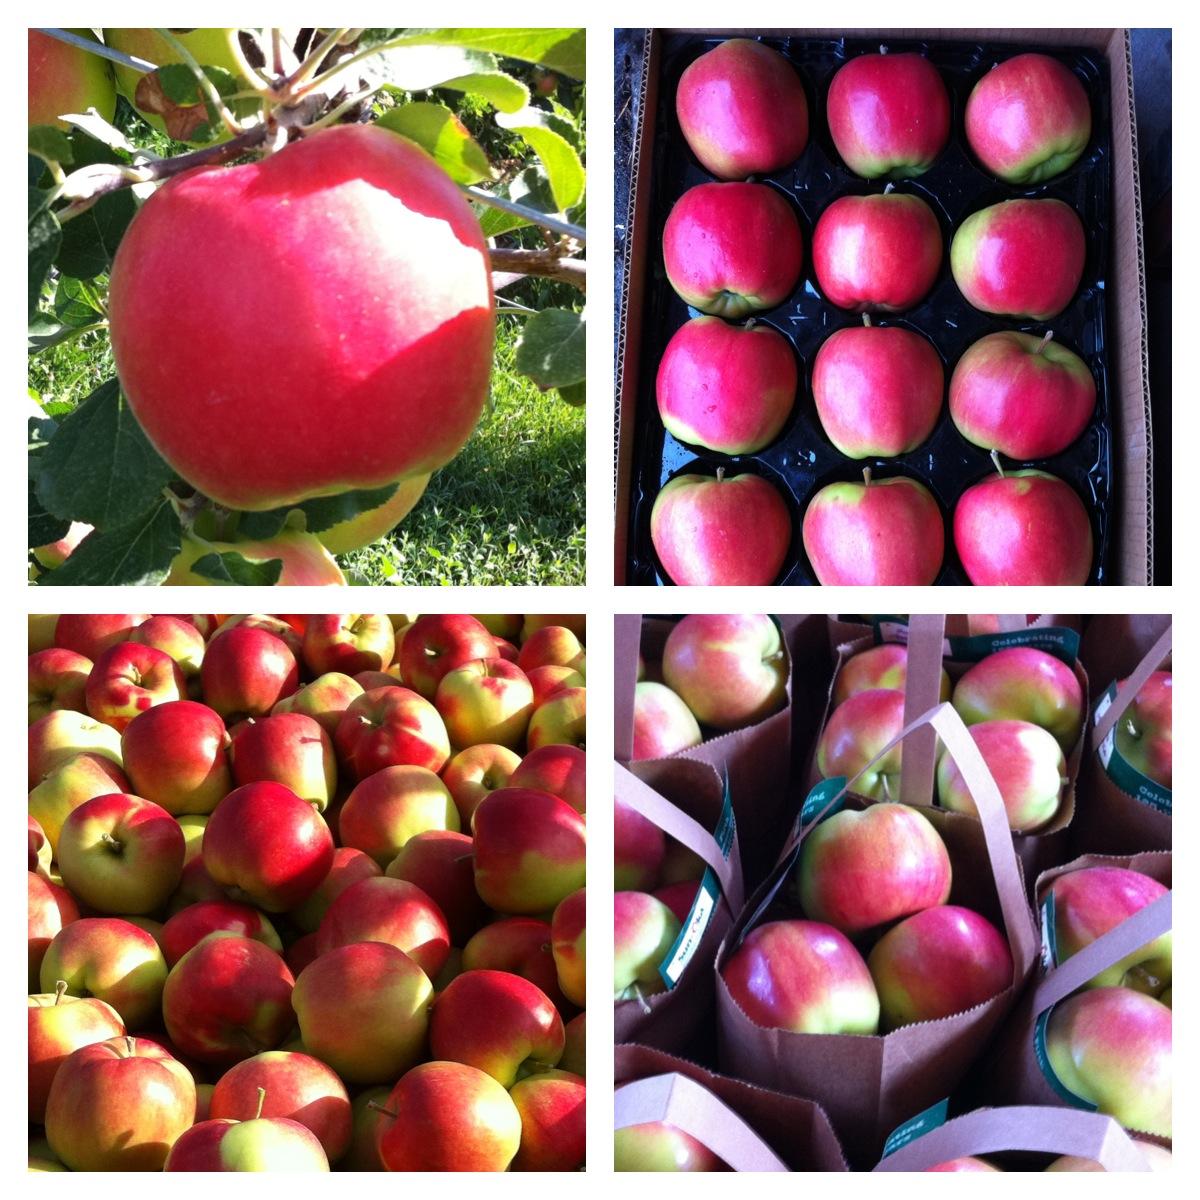 Sunrise Apple Sunrise Apples From